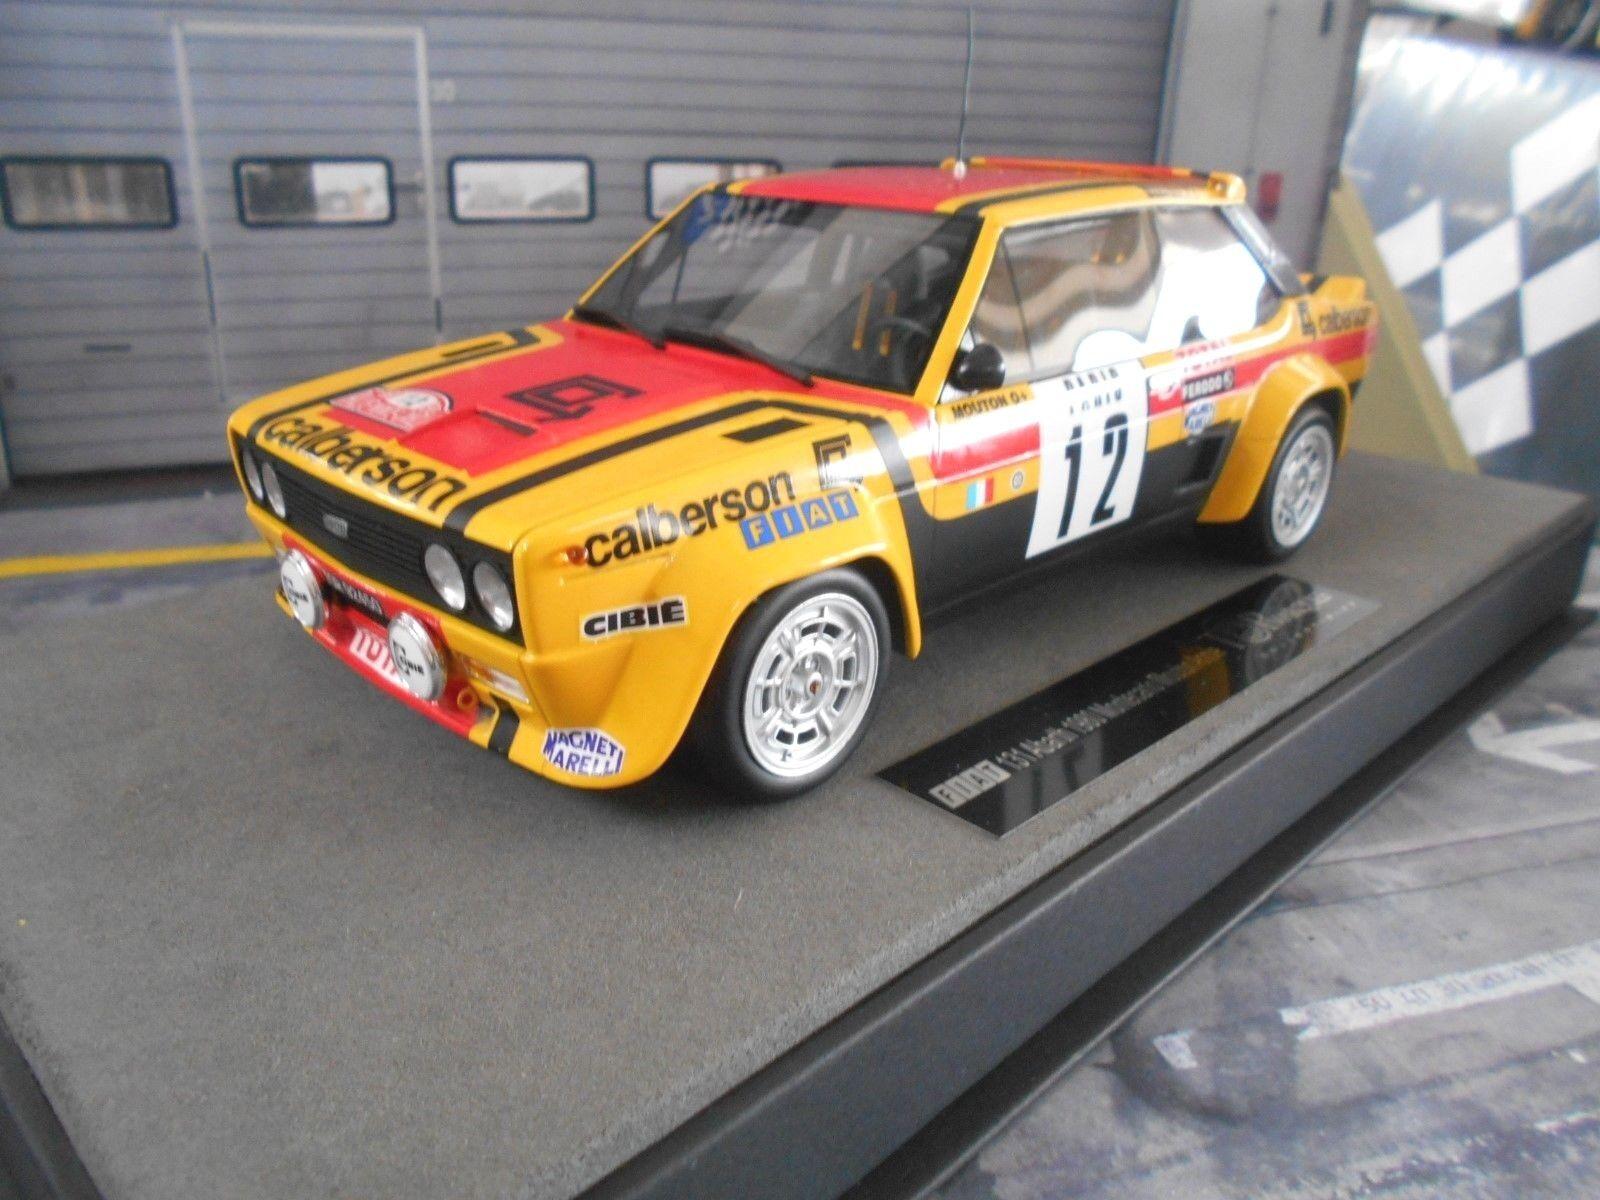 FIAT 131 Abarth Rallye Monte Carlo 1980  12 Mouton Calberson Top Marques 1 18  | Sale Düsseldorf